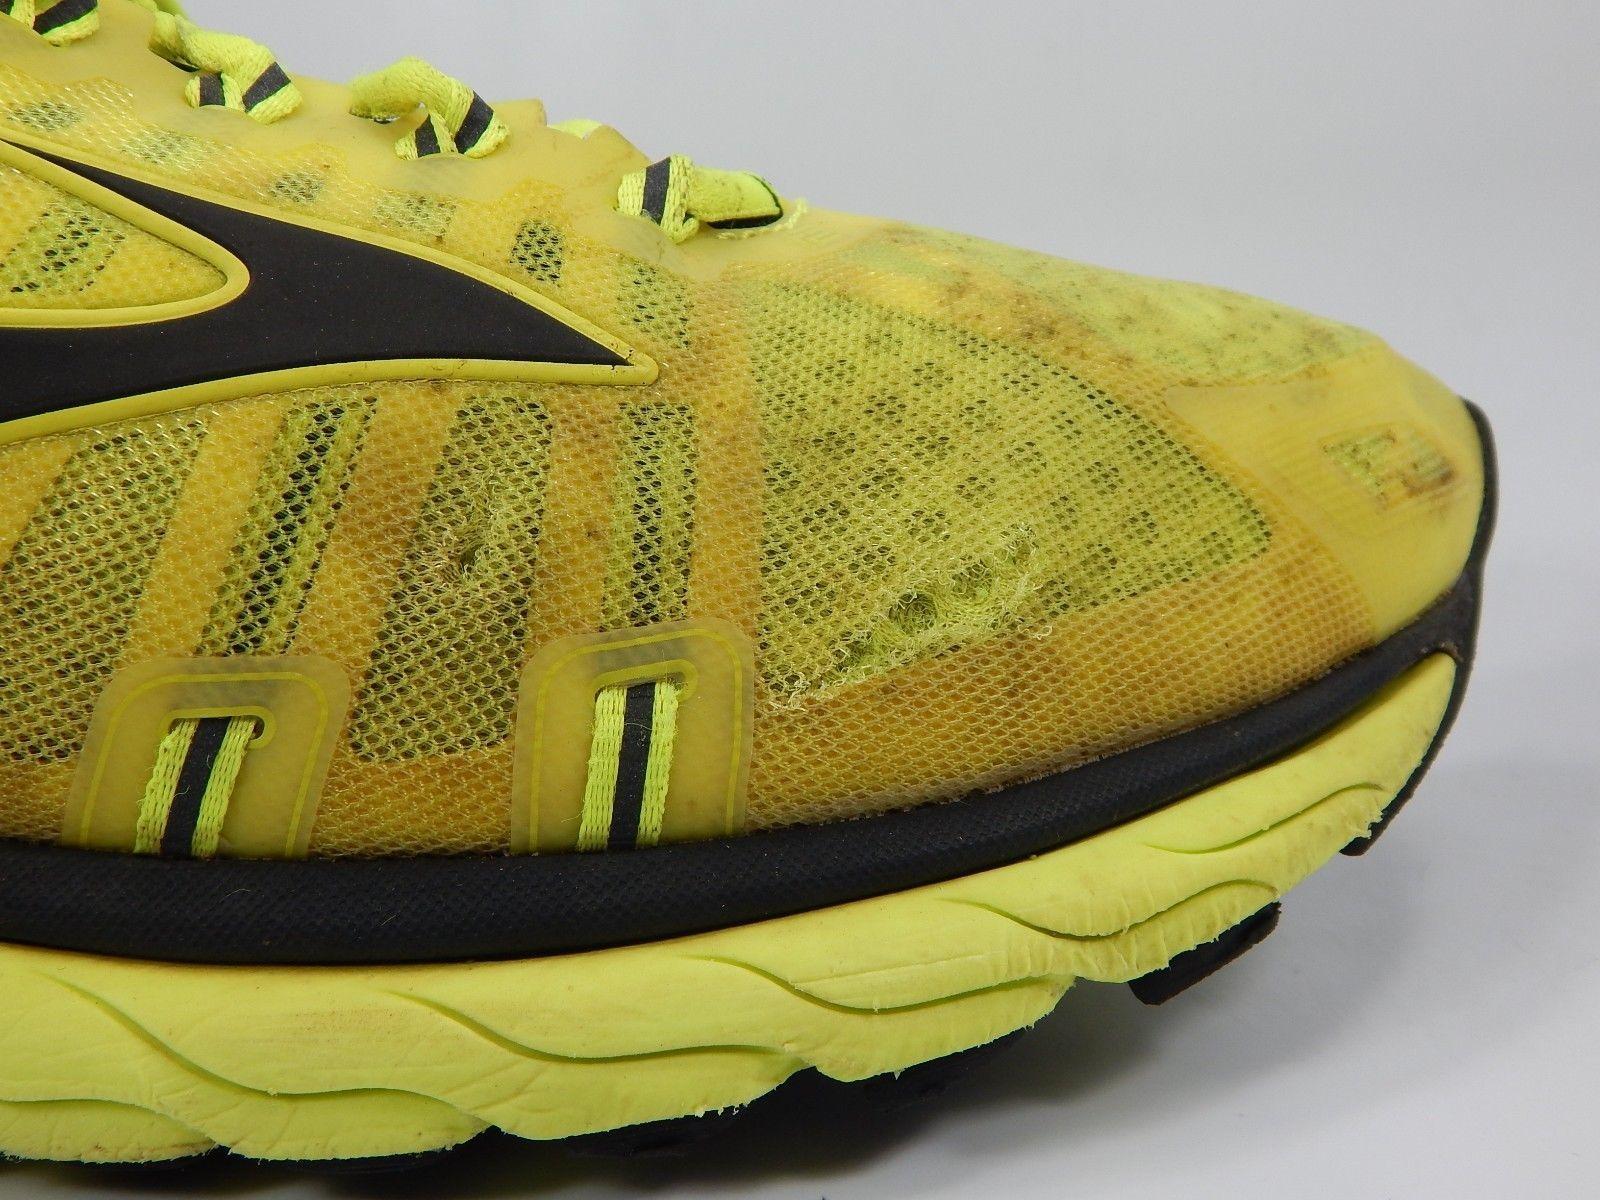 da541fdb01c Brooks Transcend 2 Size US 13 M (D) EU 47.5 Men s Running Shoes ...